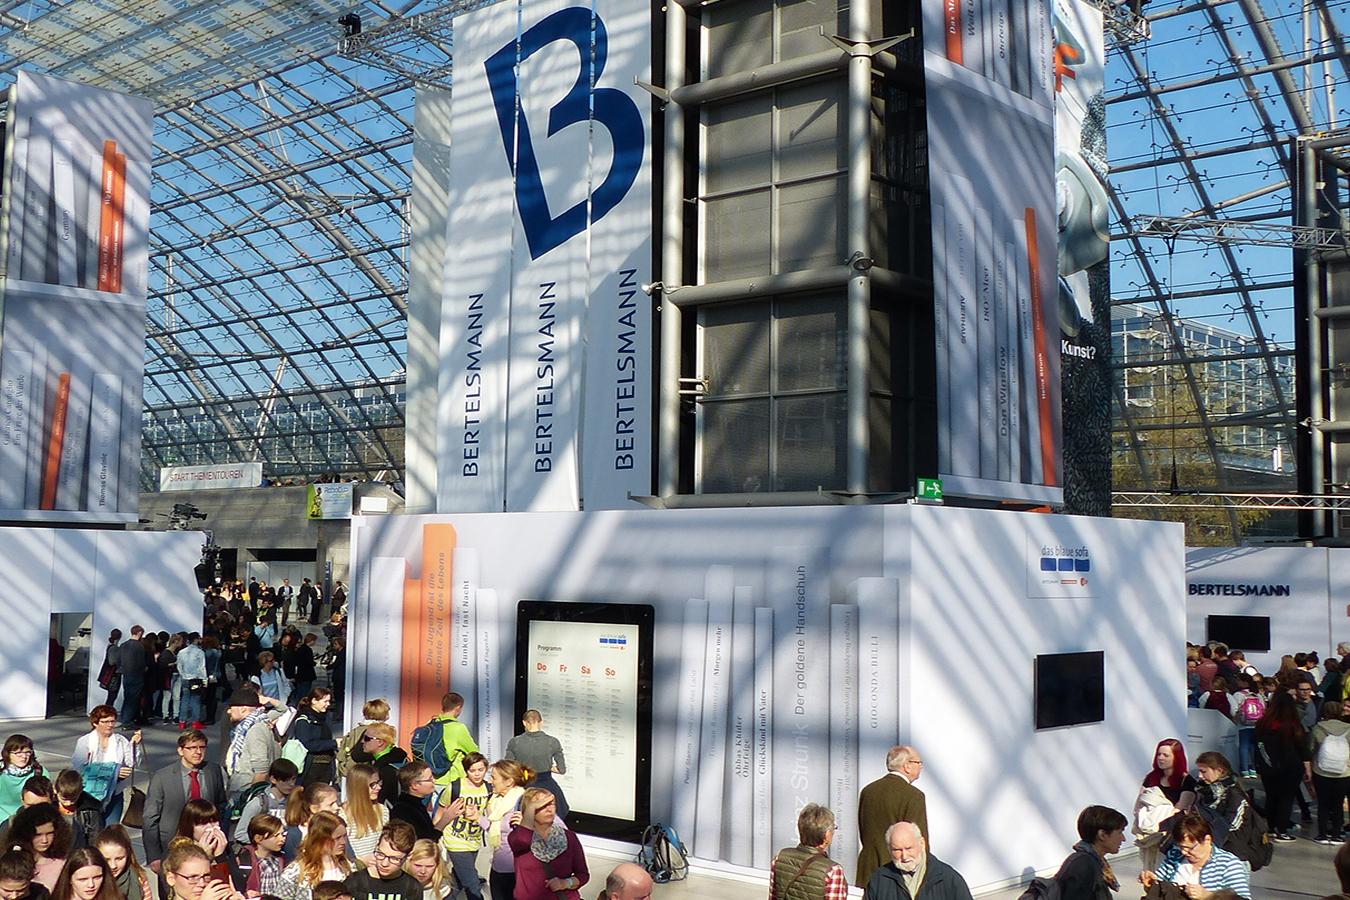 Full Size of Blaue Couch Bayern 1 Podcast Zdf Blaues Sofa Leipziger Buchmesse 2018 Programm Frankfurt Leipzig 2019 Samt Ikea Das Frankfurter Leder Federkern Englisch Graues Sofa Blaues Sofa